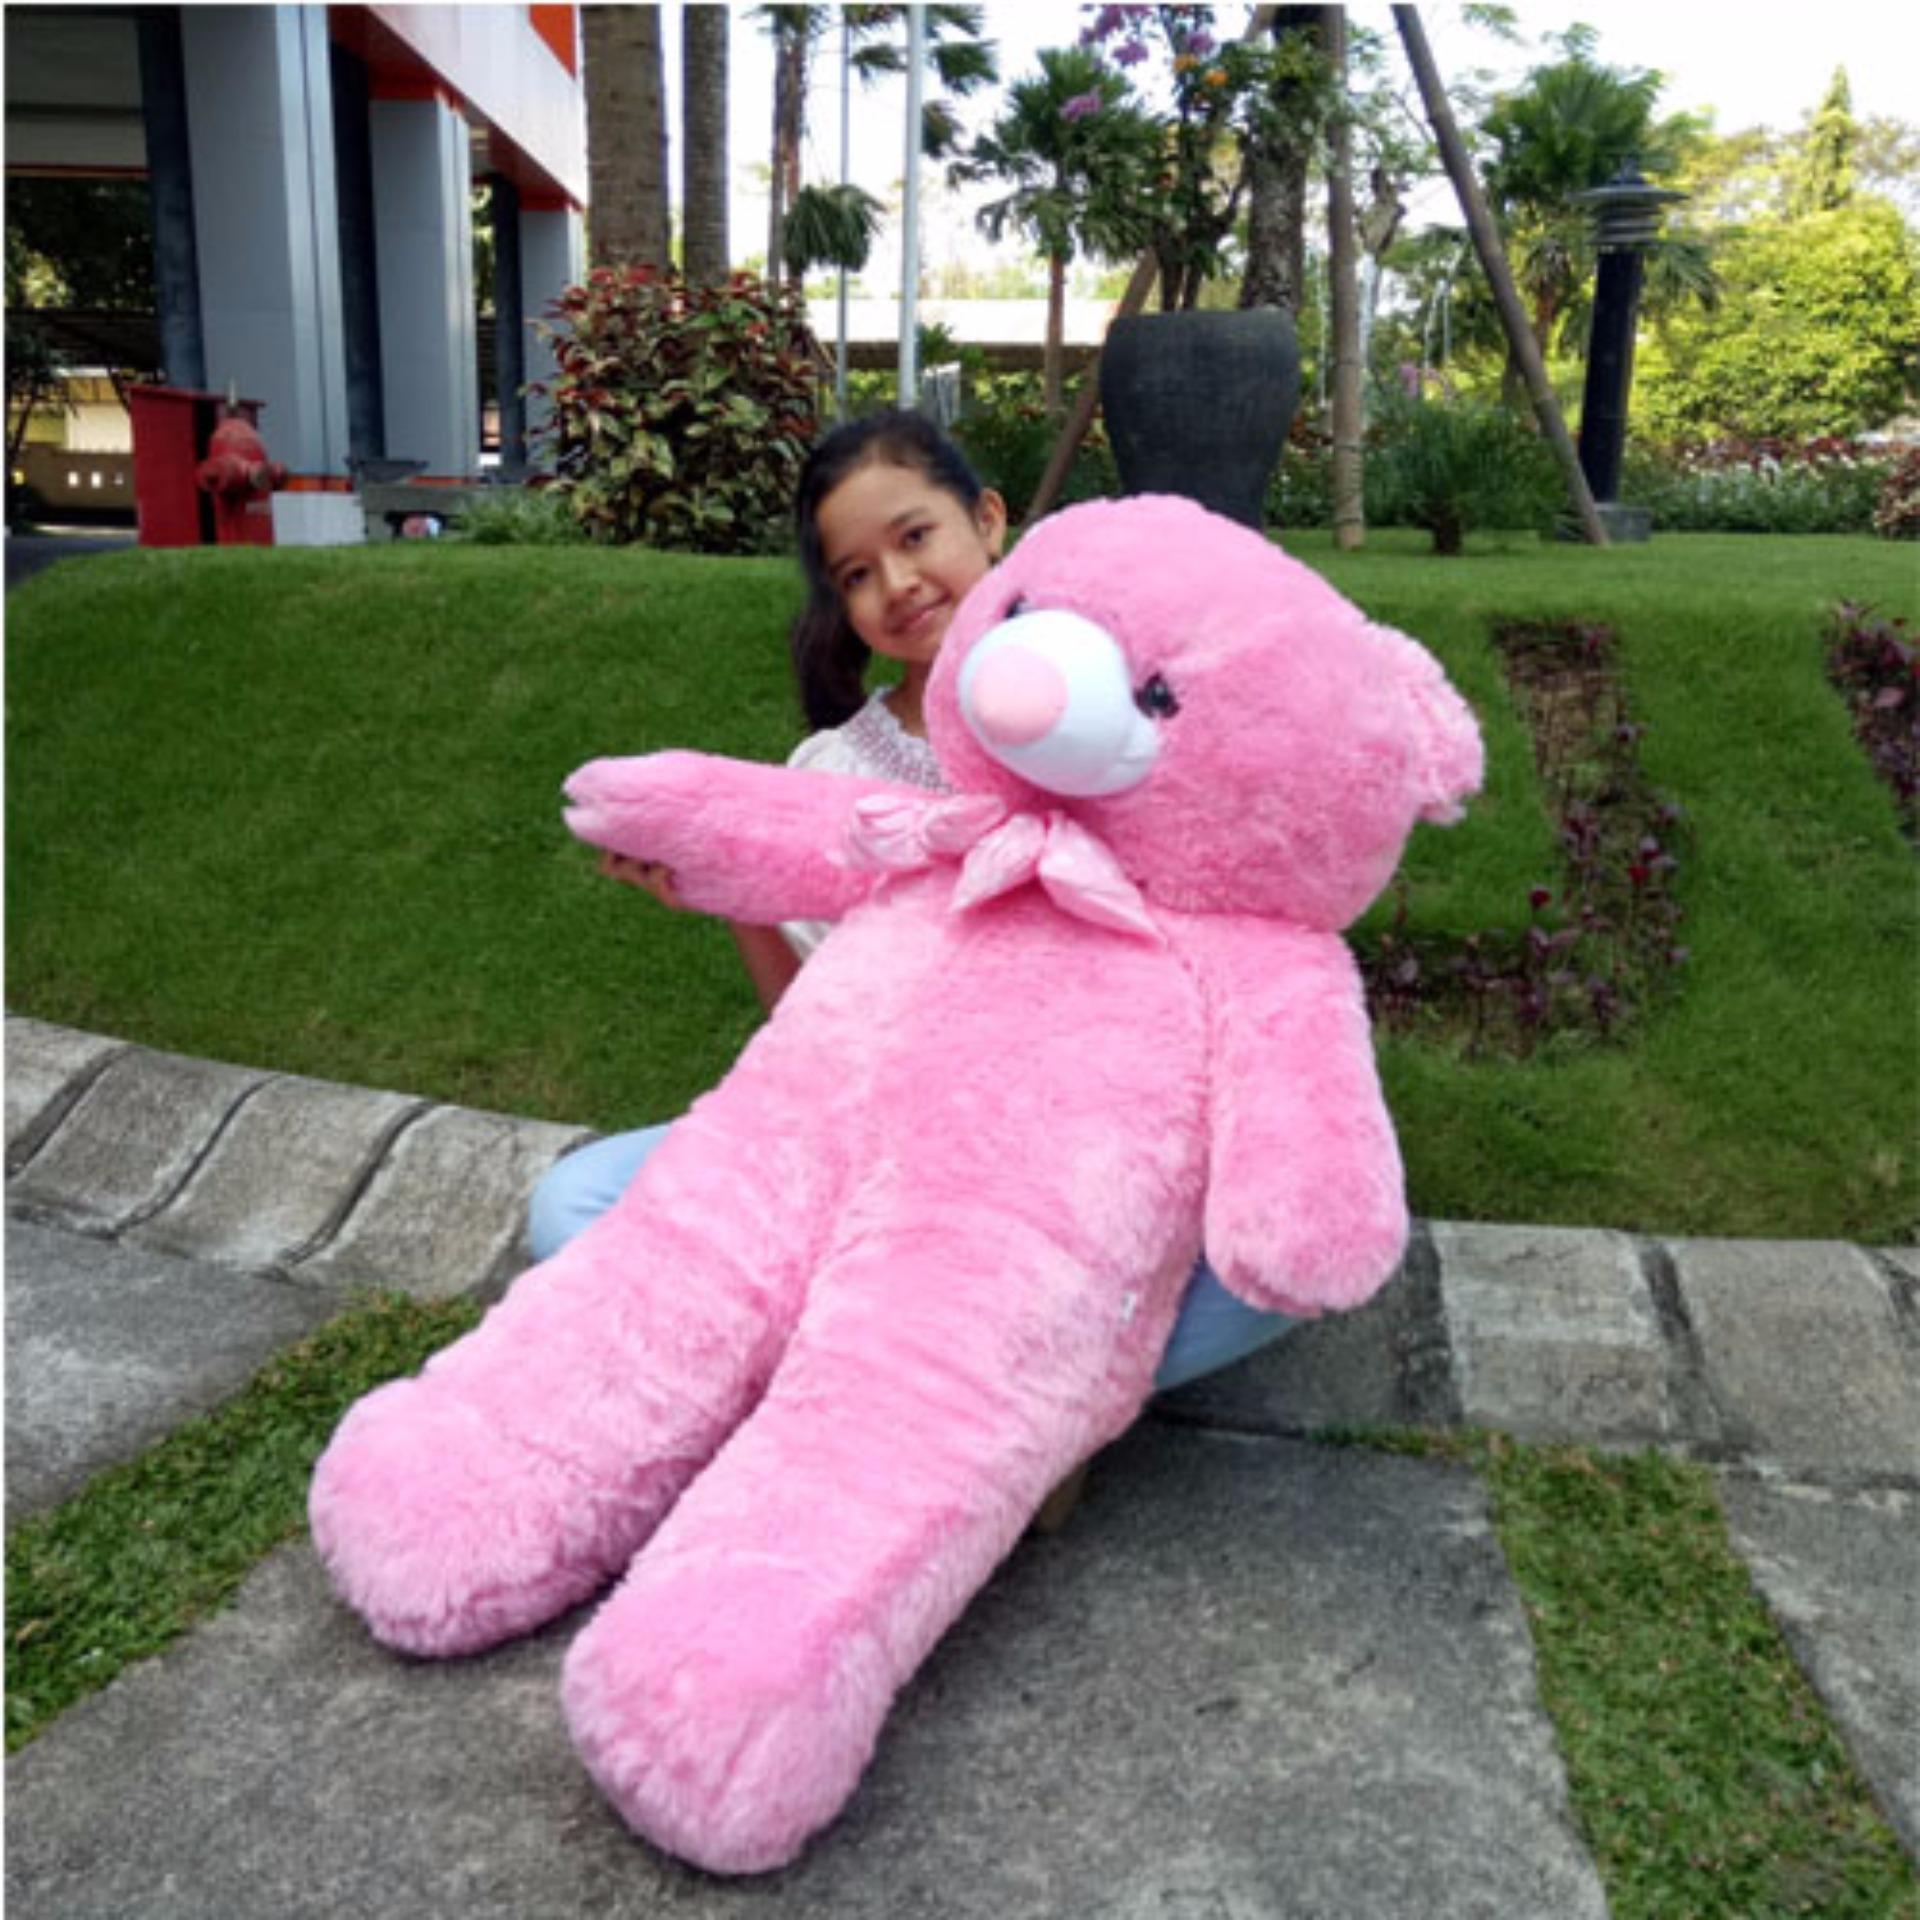 Harga Baru Tr Boneka Beruang Teddy Bear Jumbo 125 Cm Pink Price Checker